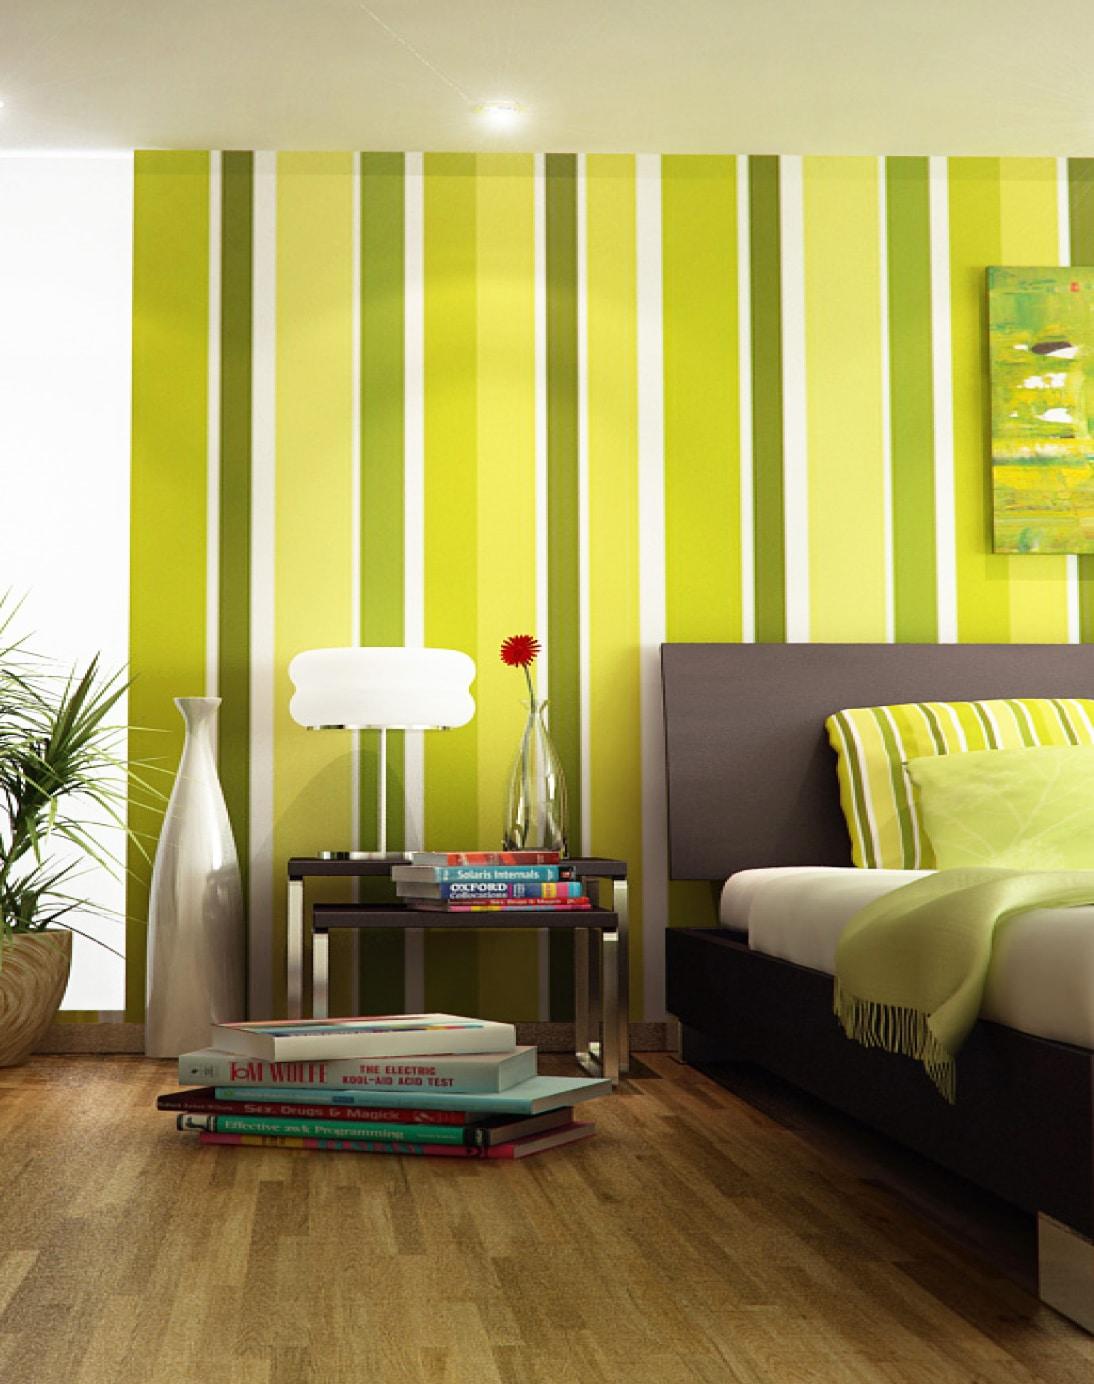 lemonbe-inspirate en las frutas de temporada para decorar tu hogar-07